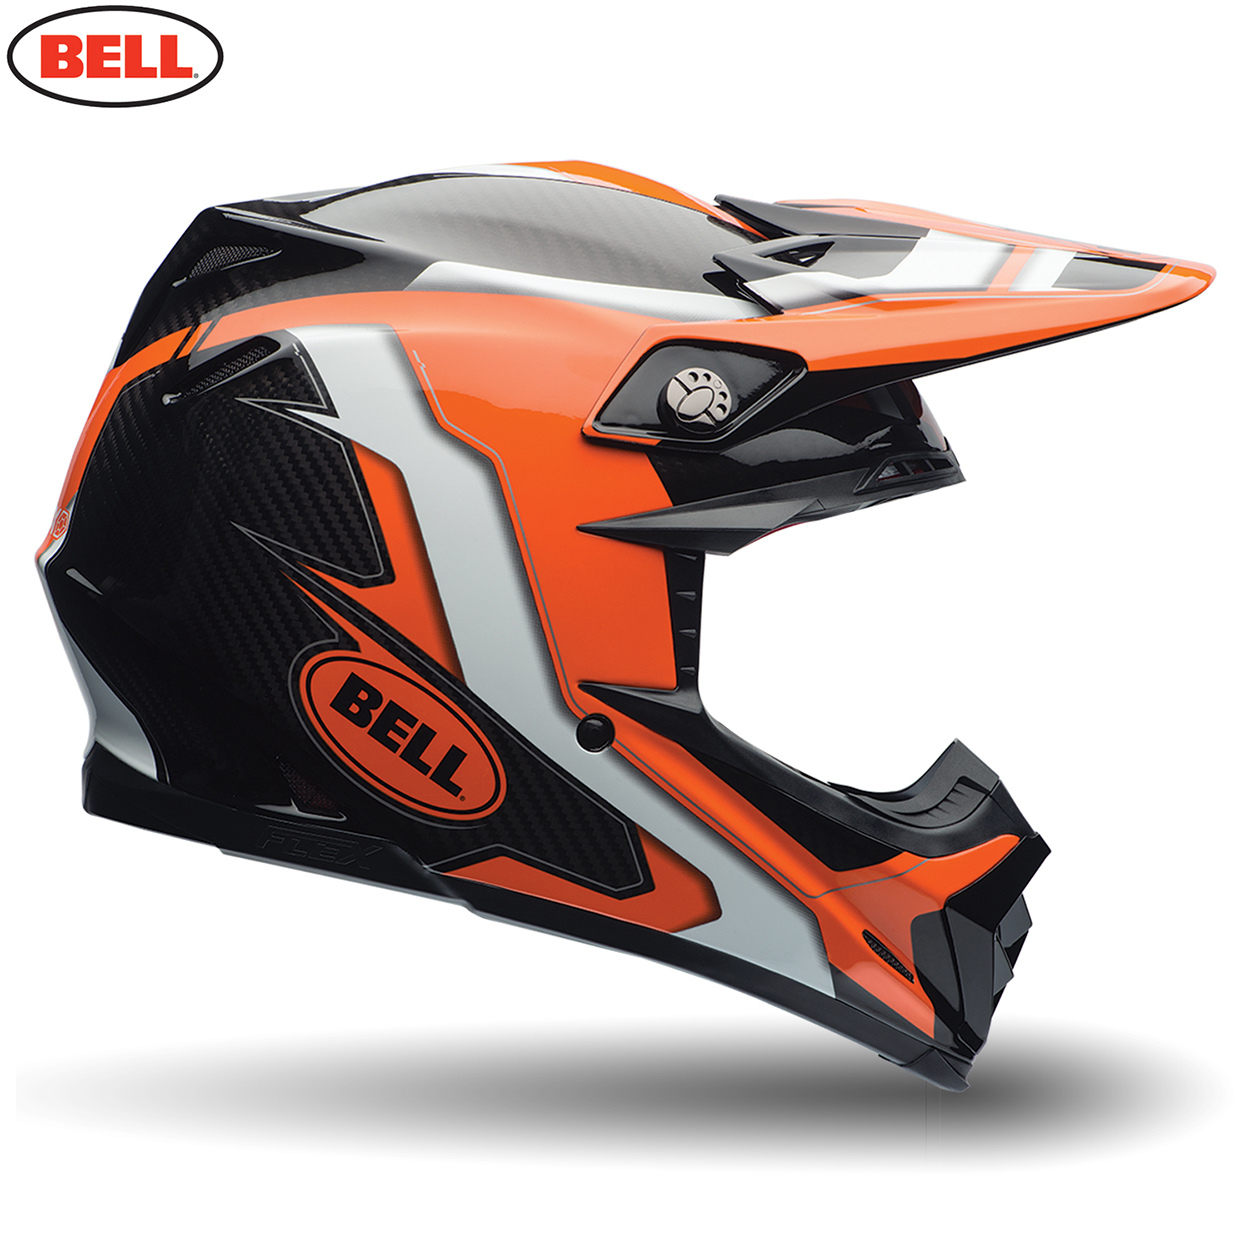 b18a6f36 2017 MX Bell Moto 9 Flex Factory Orange